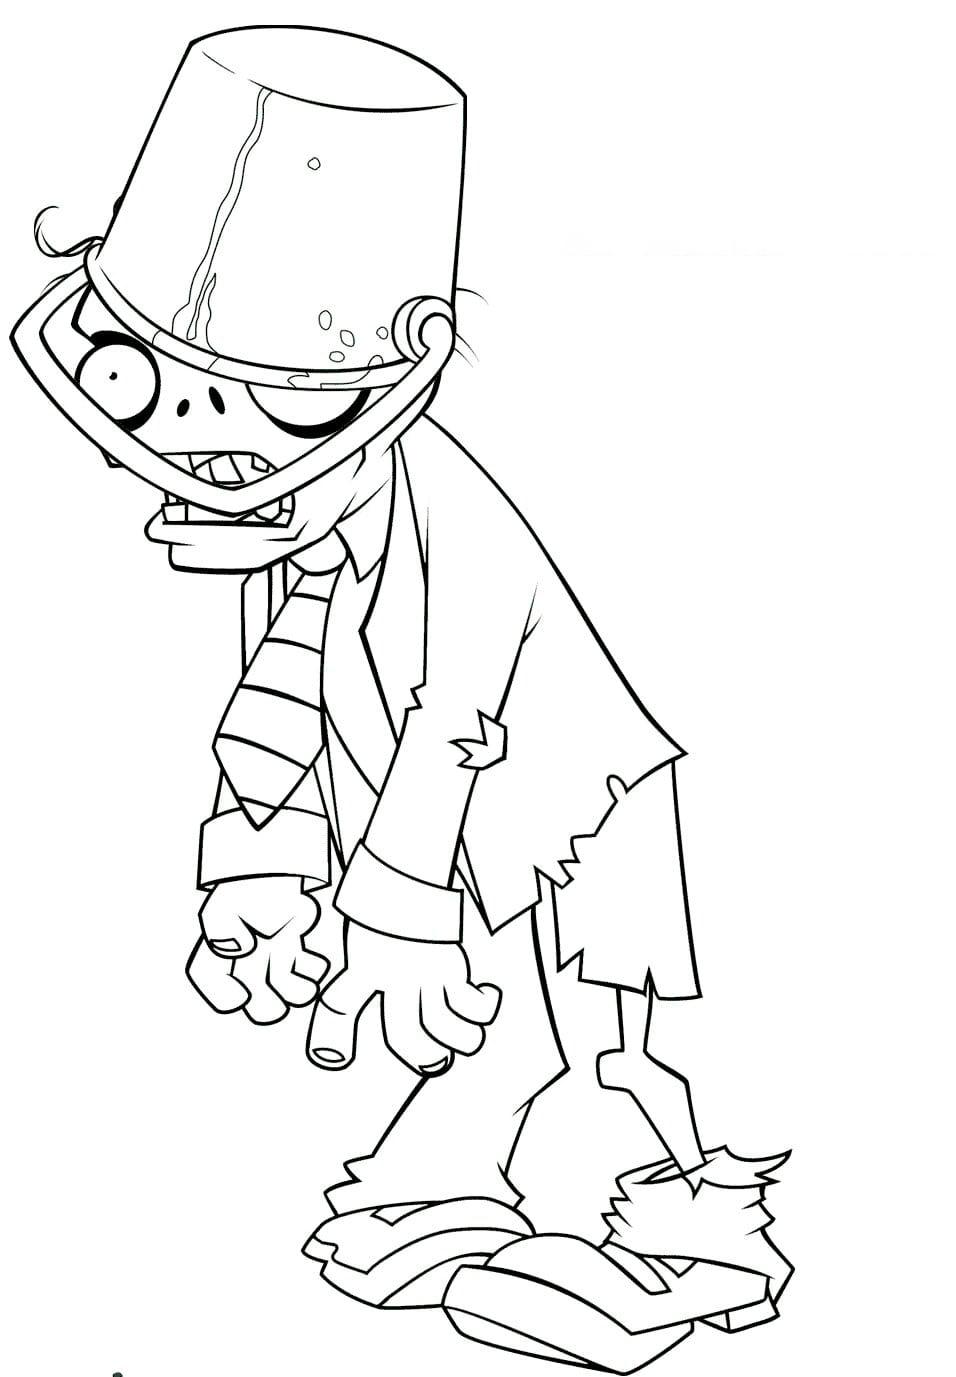 Buckethead Zombie Coloring Page